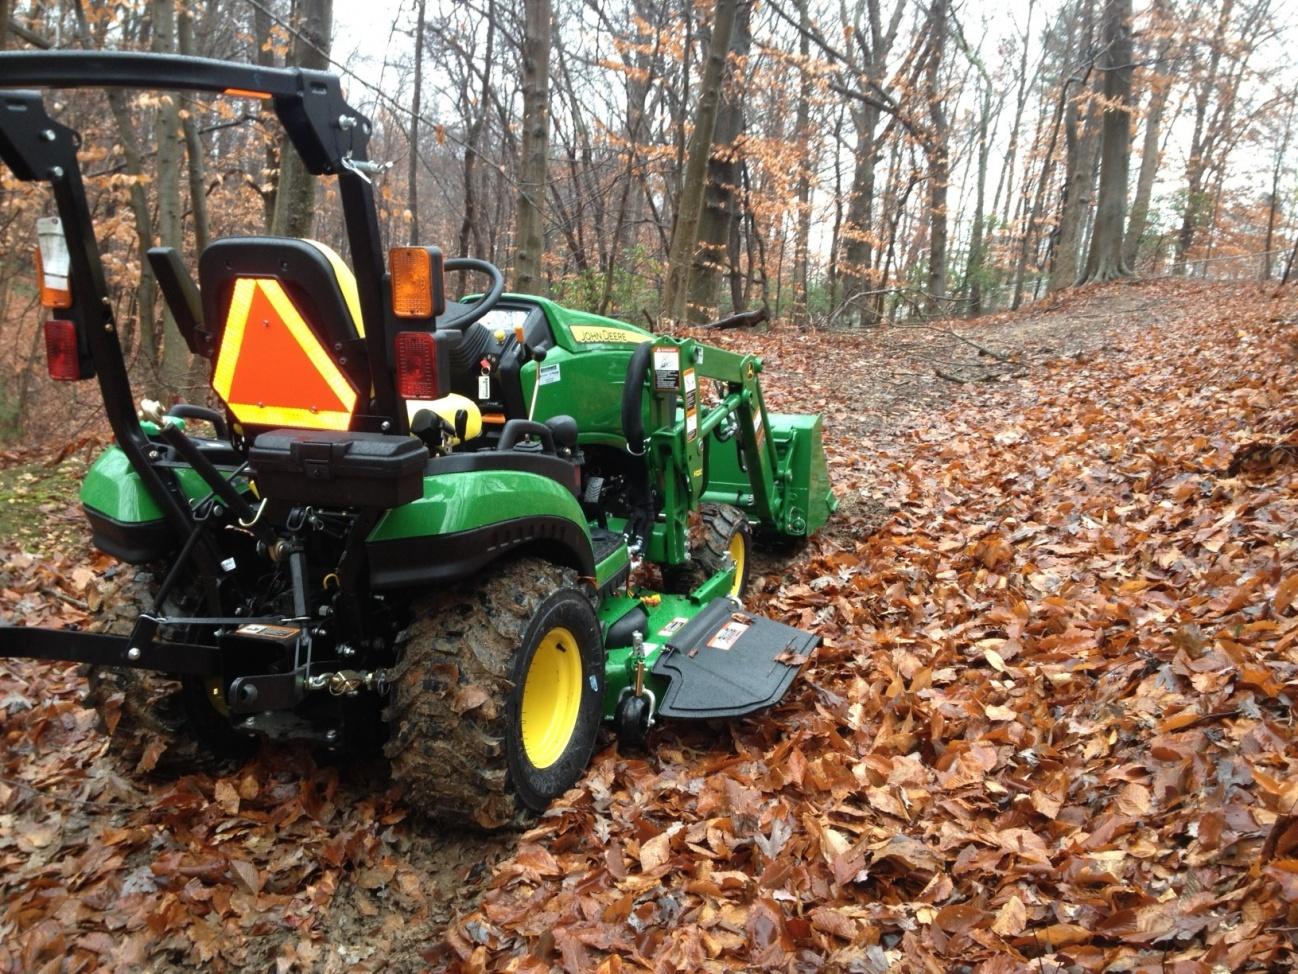 New 1025R - MyTractorForum com - The Friendliest Tractor